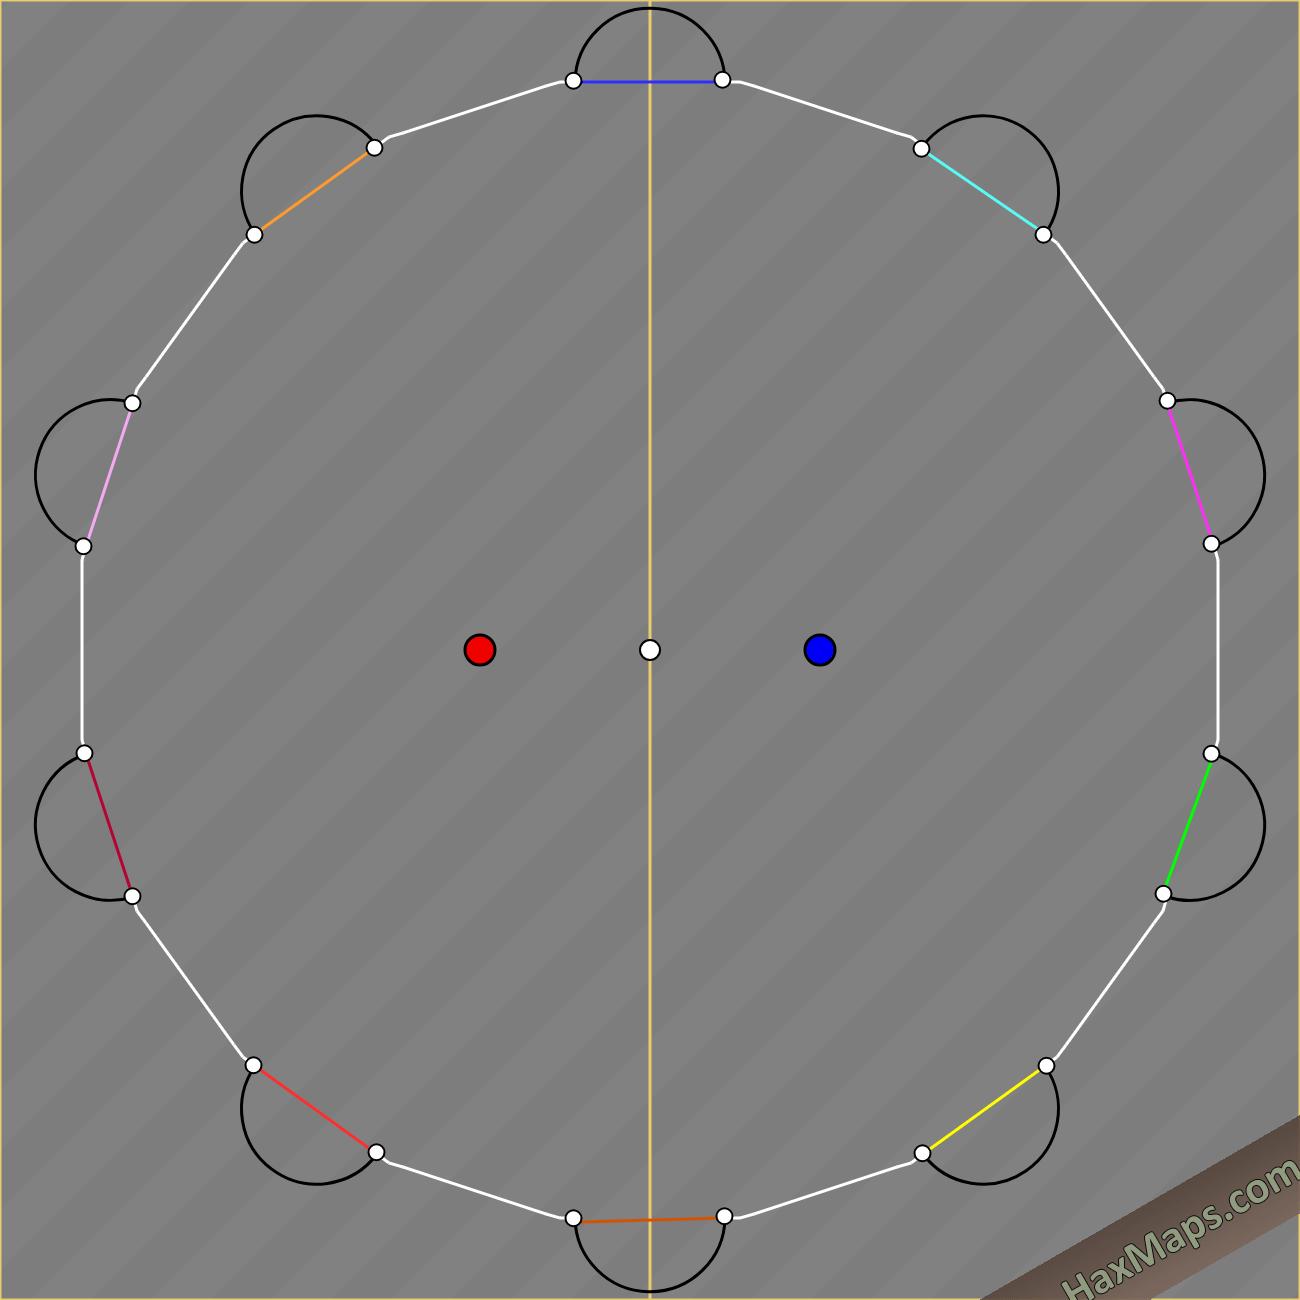 hax ball maps | v10 Japon Kale Full Html Version 2 by Minerva